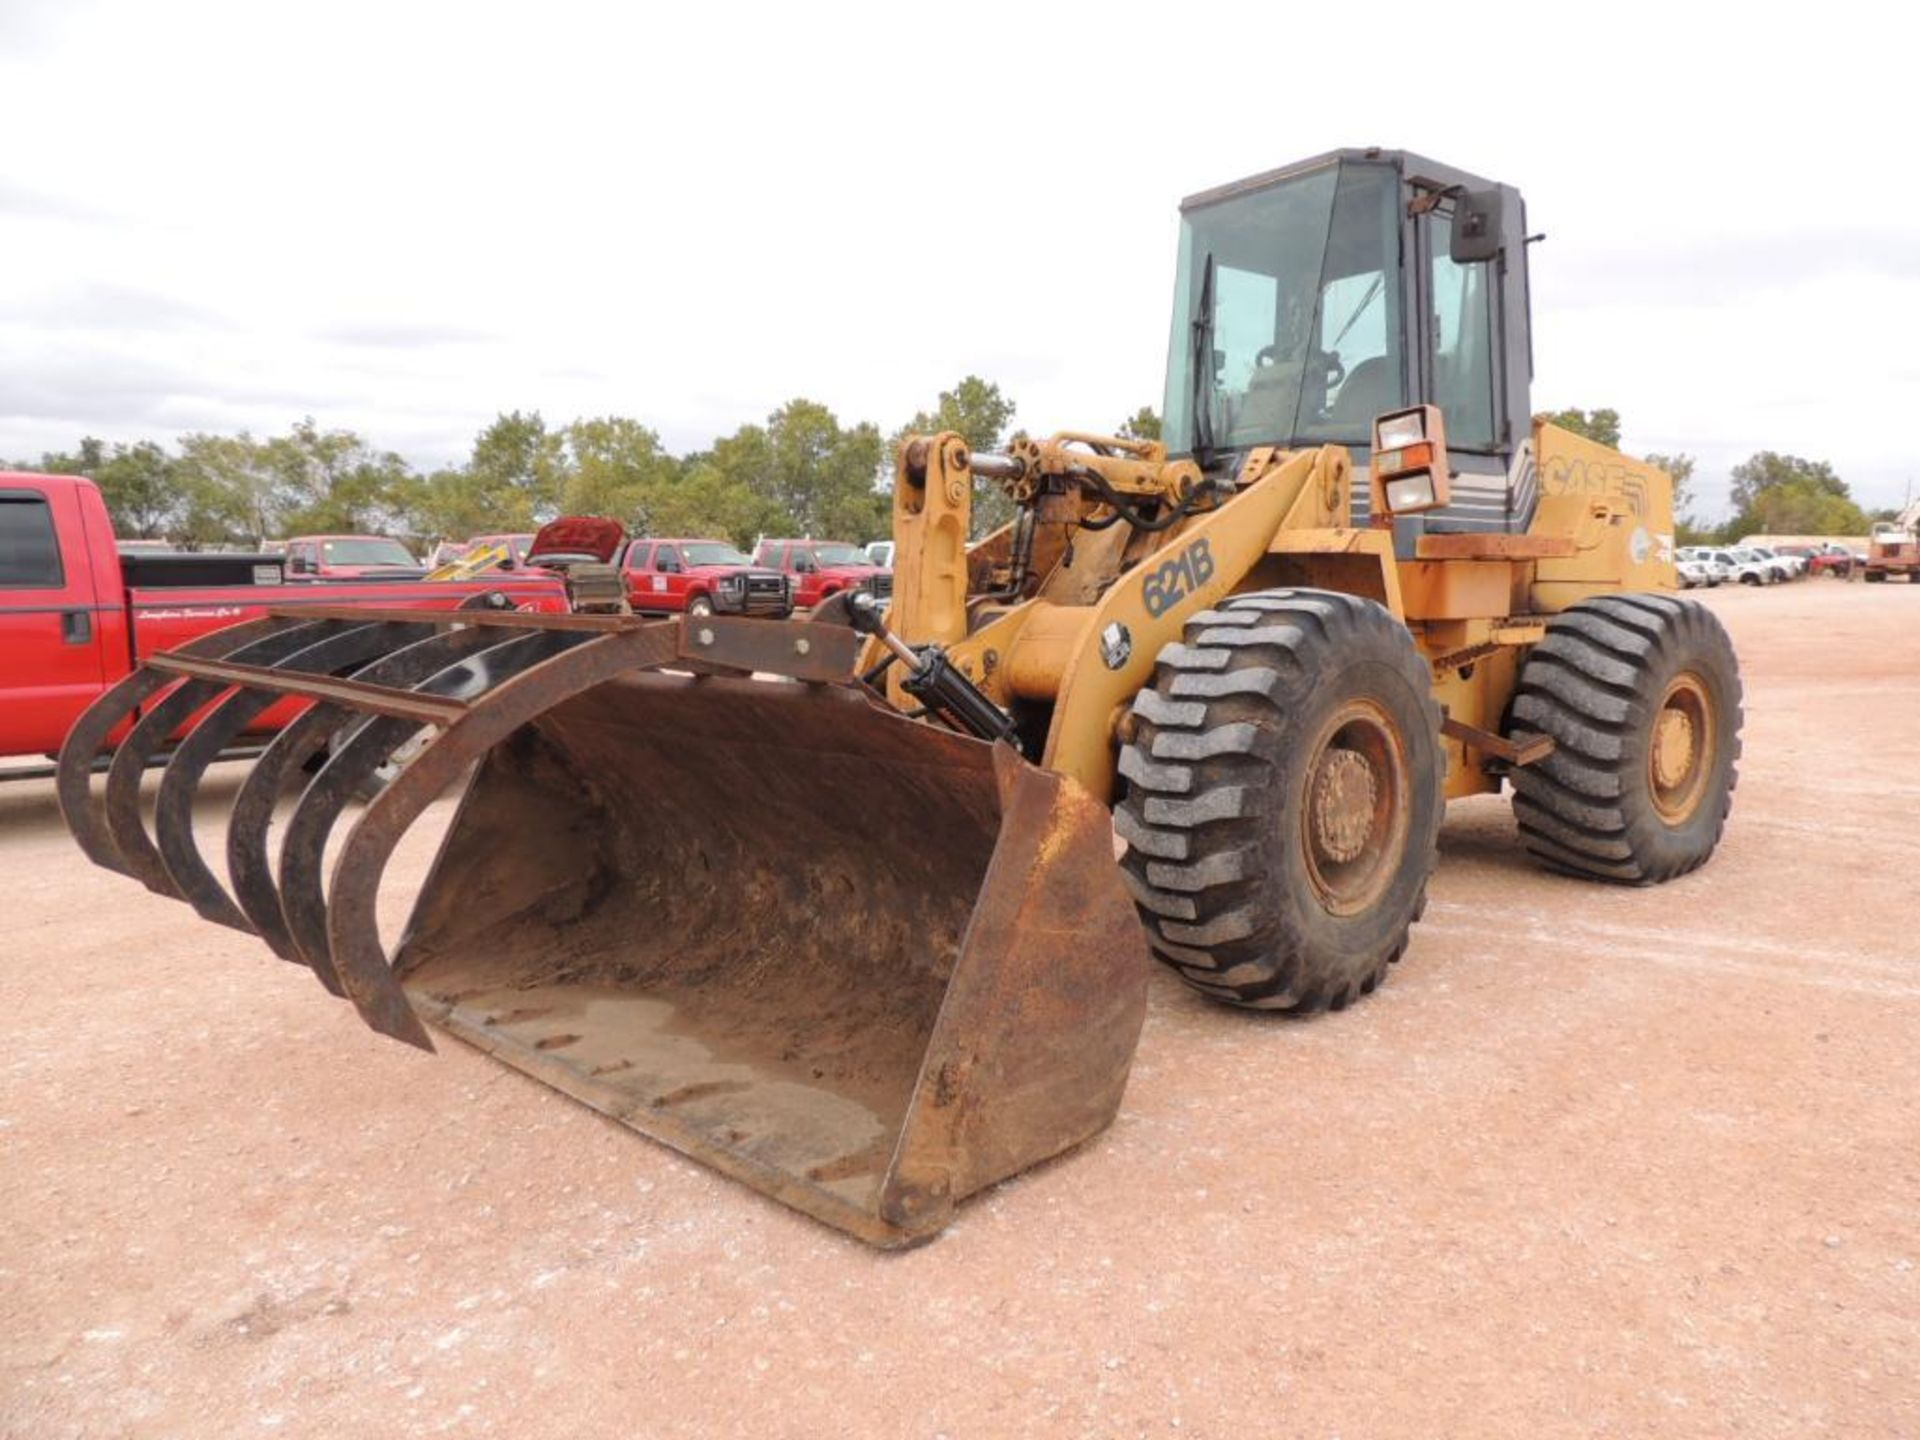 Case 621B Wheel Loader, 100 in. GP Bucket, Grapple, Brake Pressure Low, Transmission Will Not